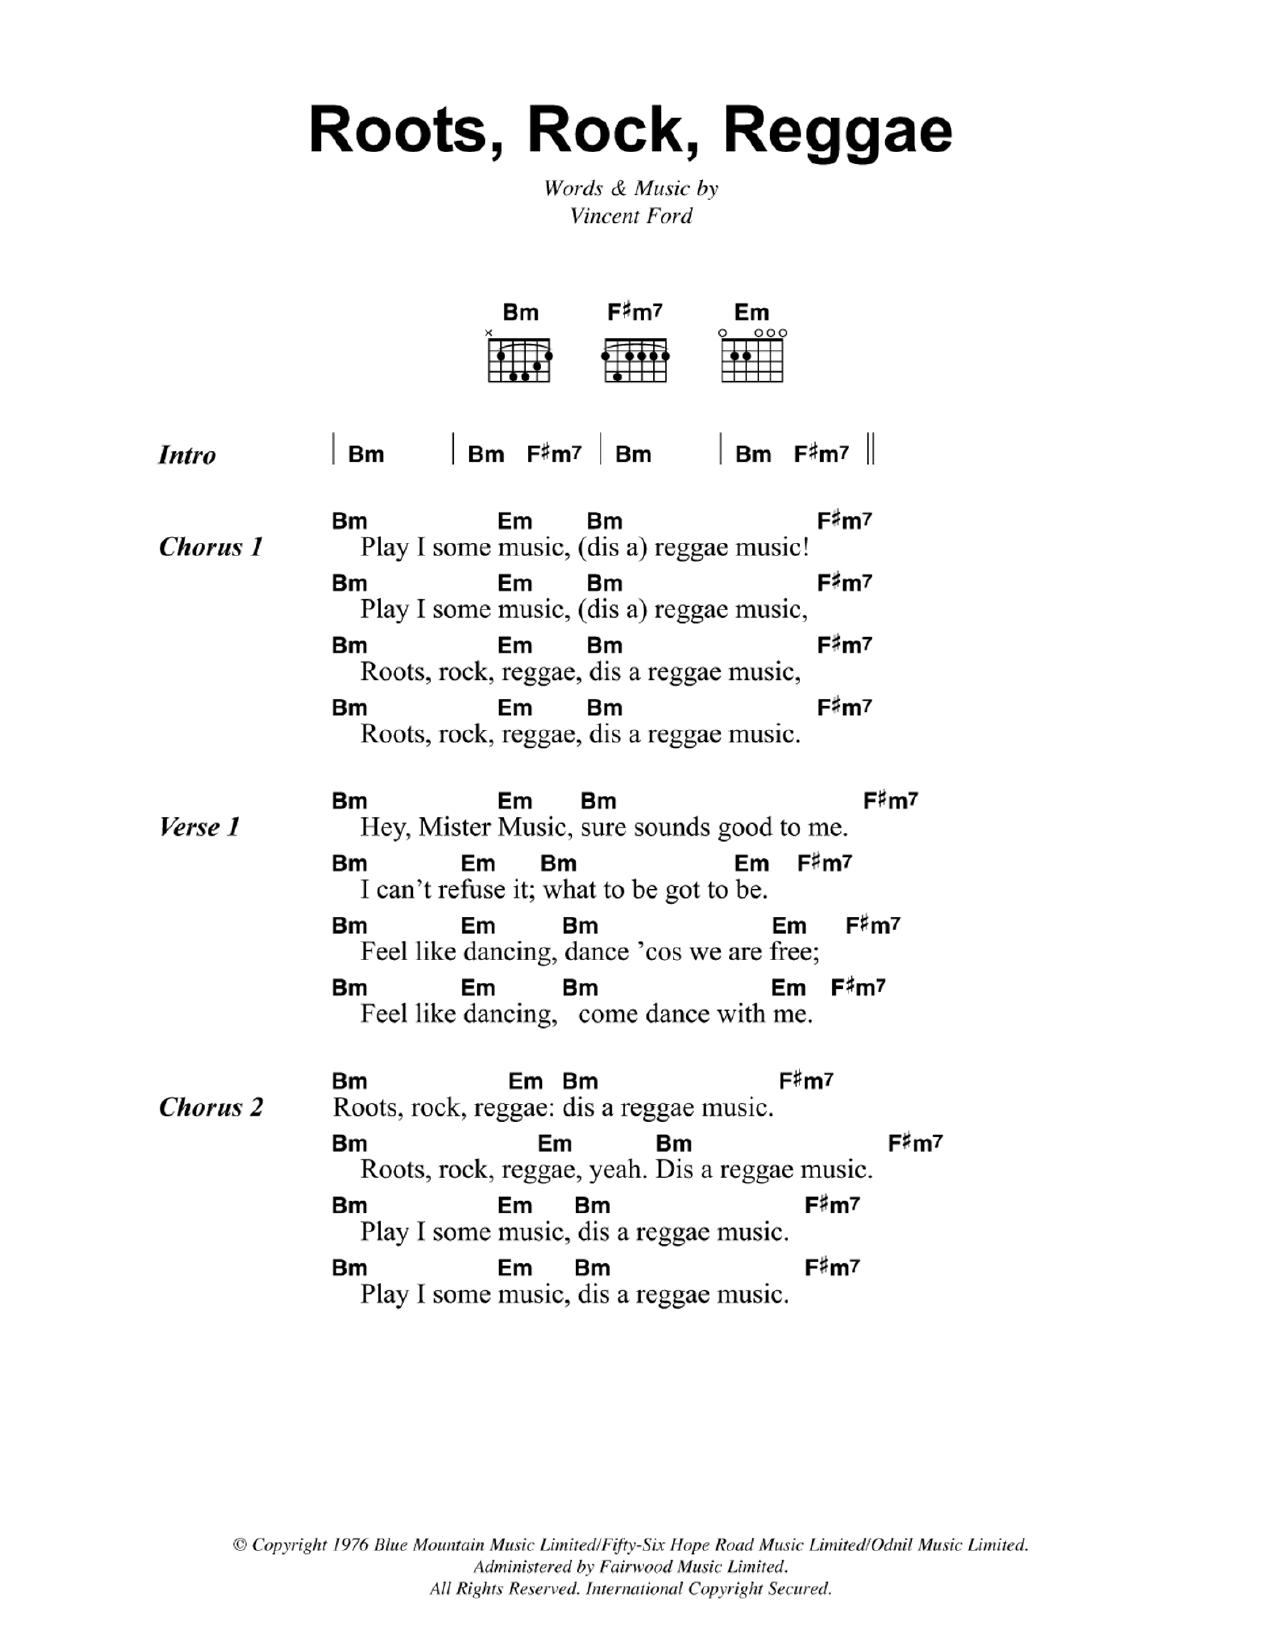 Roots, Rock, Reggae (Guitar Chords/Lyrics)